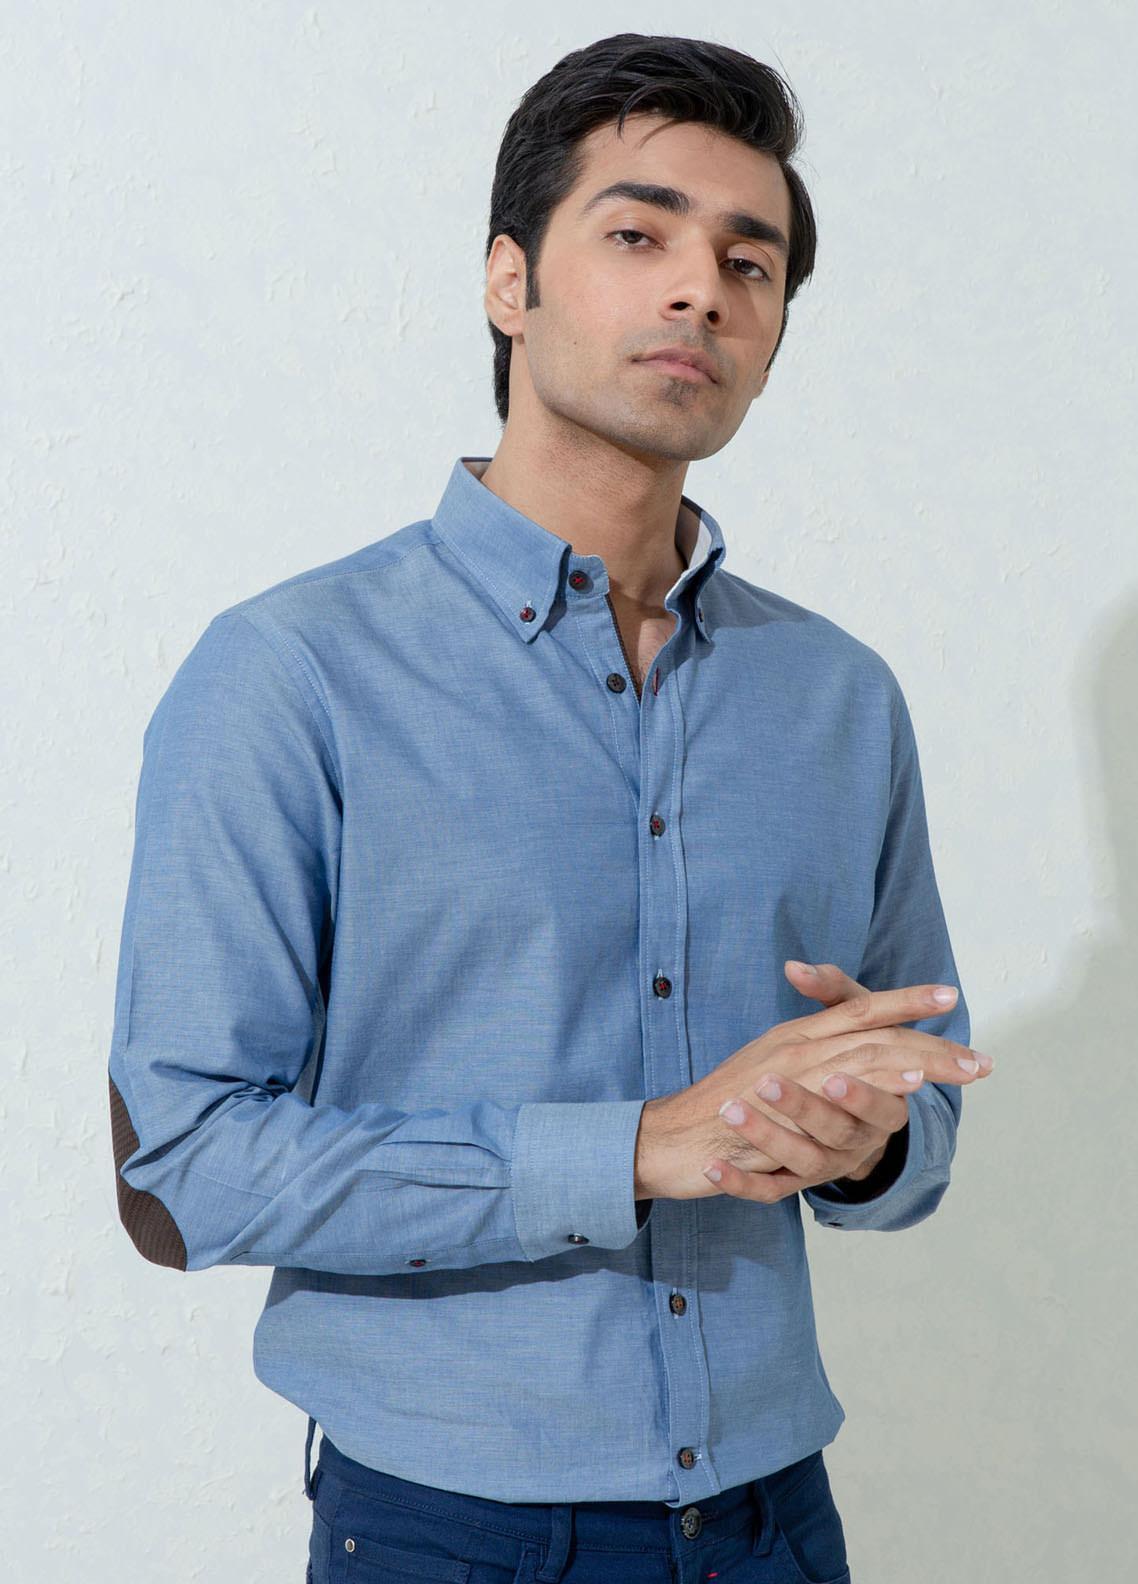 Brumano Cotton Casual Men Shirts -  BM21SH Blue Light Weight